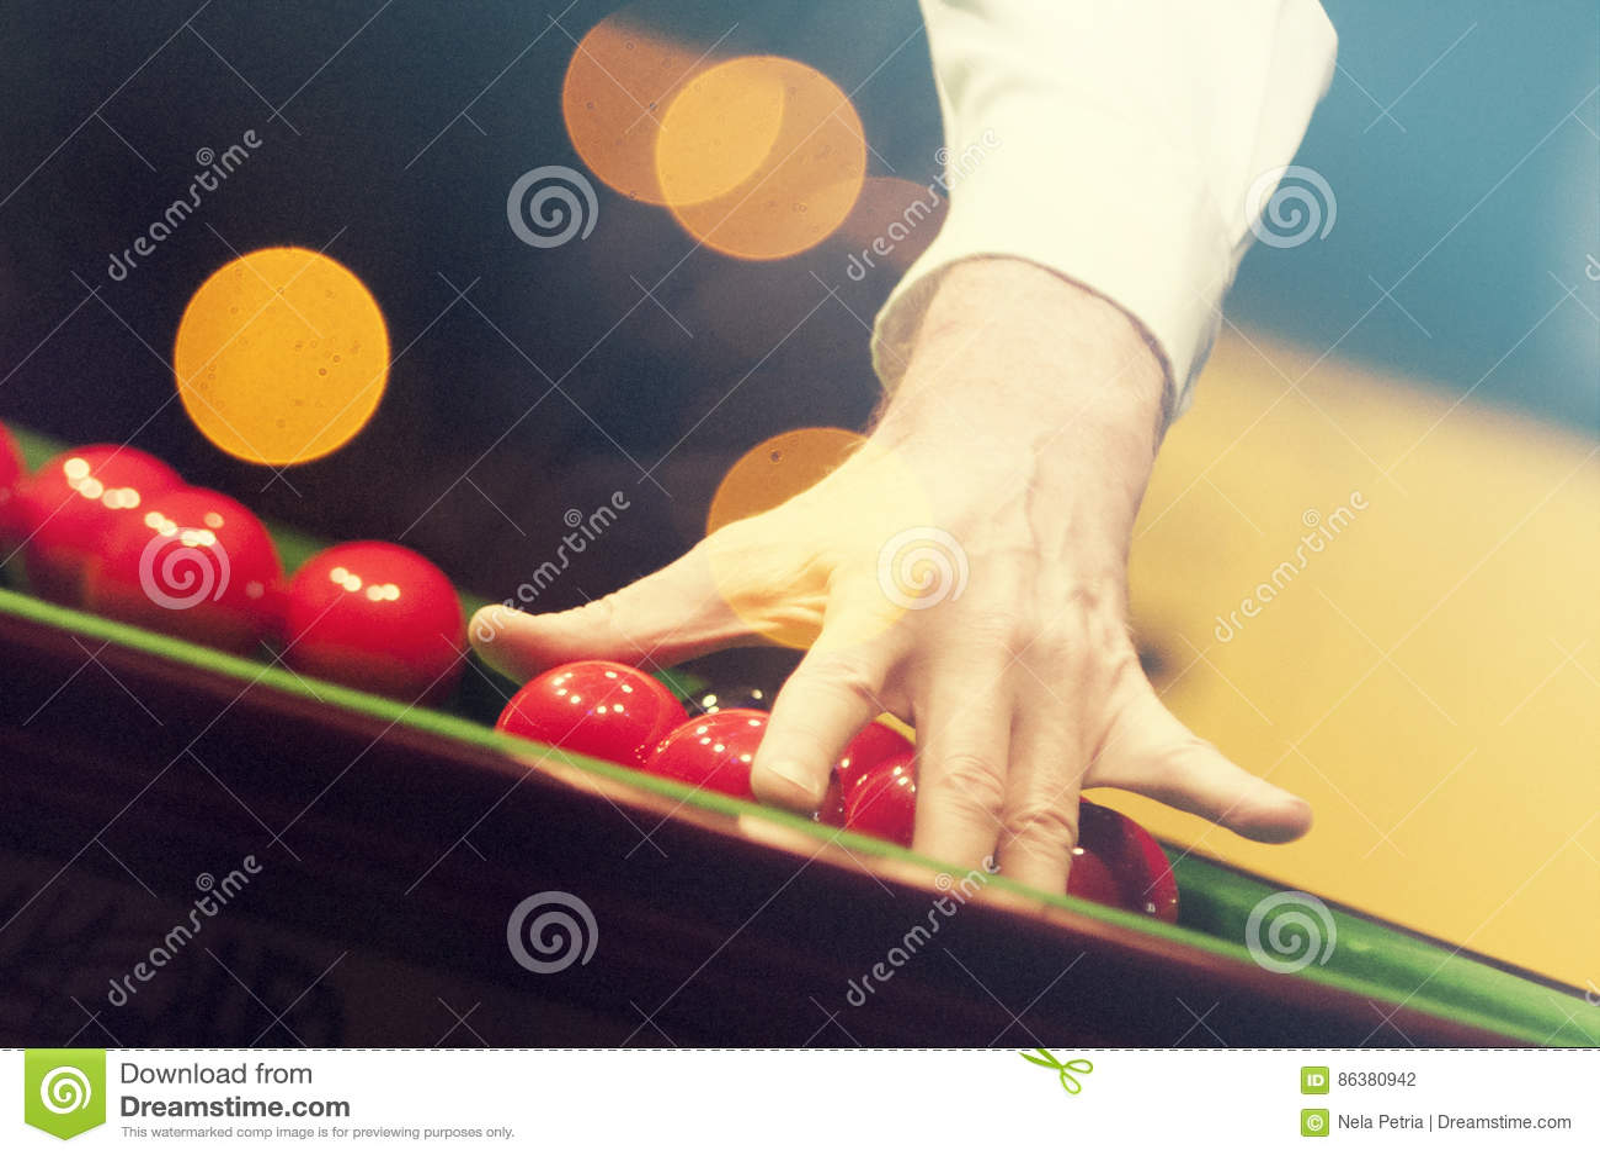 Snooker player stock photo  Image of billiard, black - 86380942